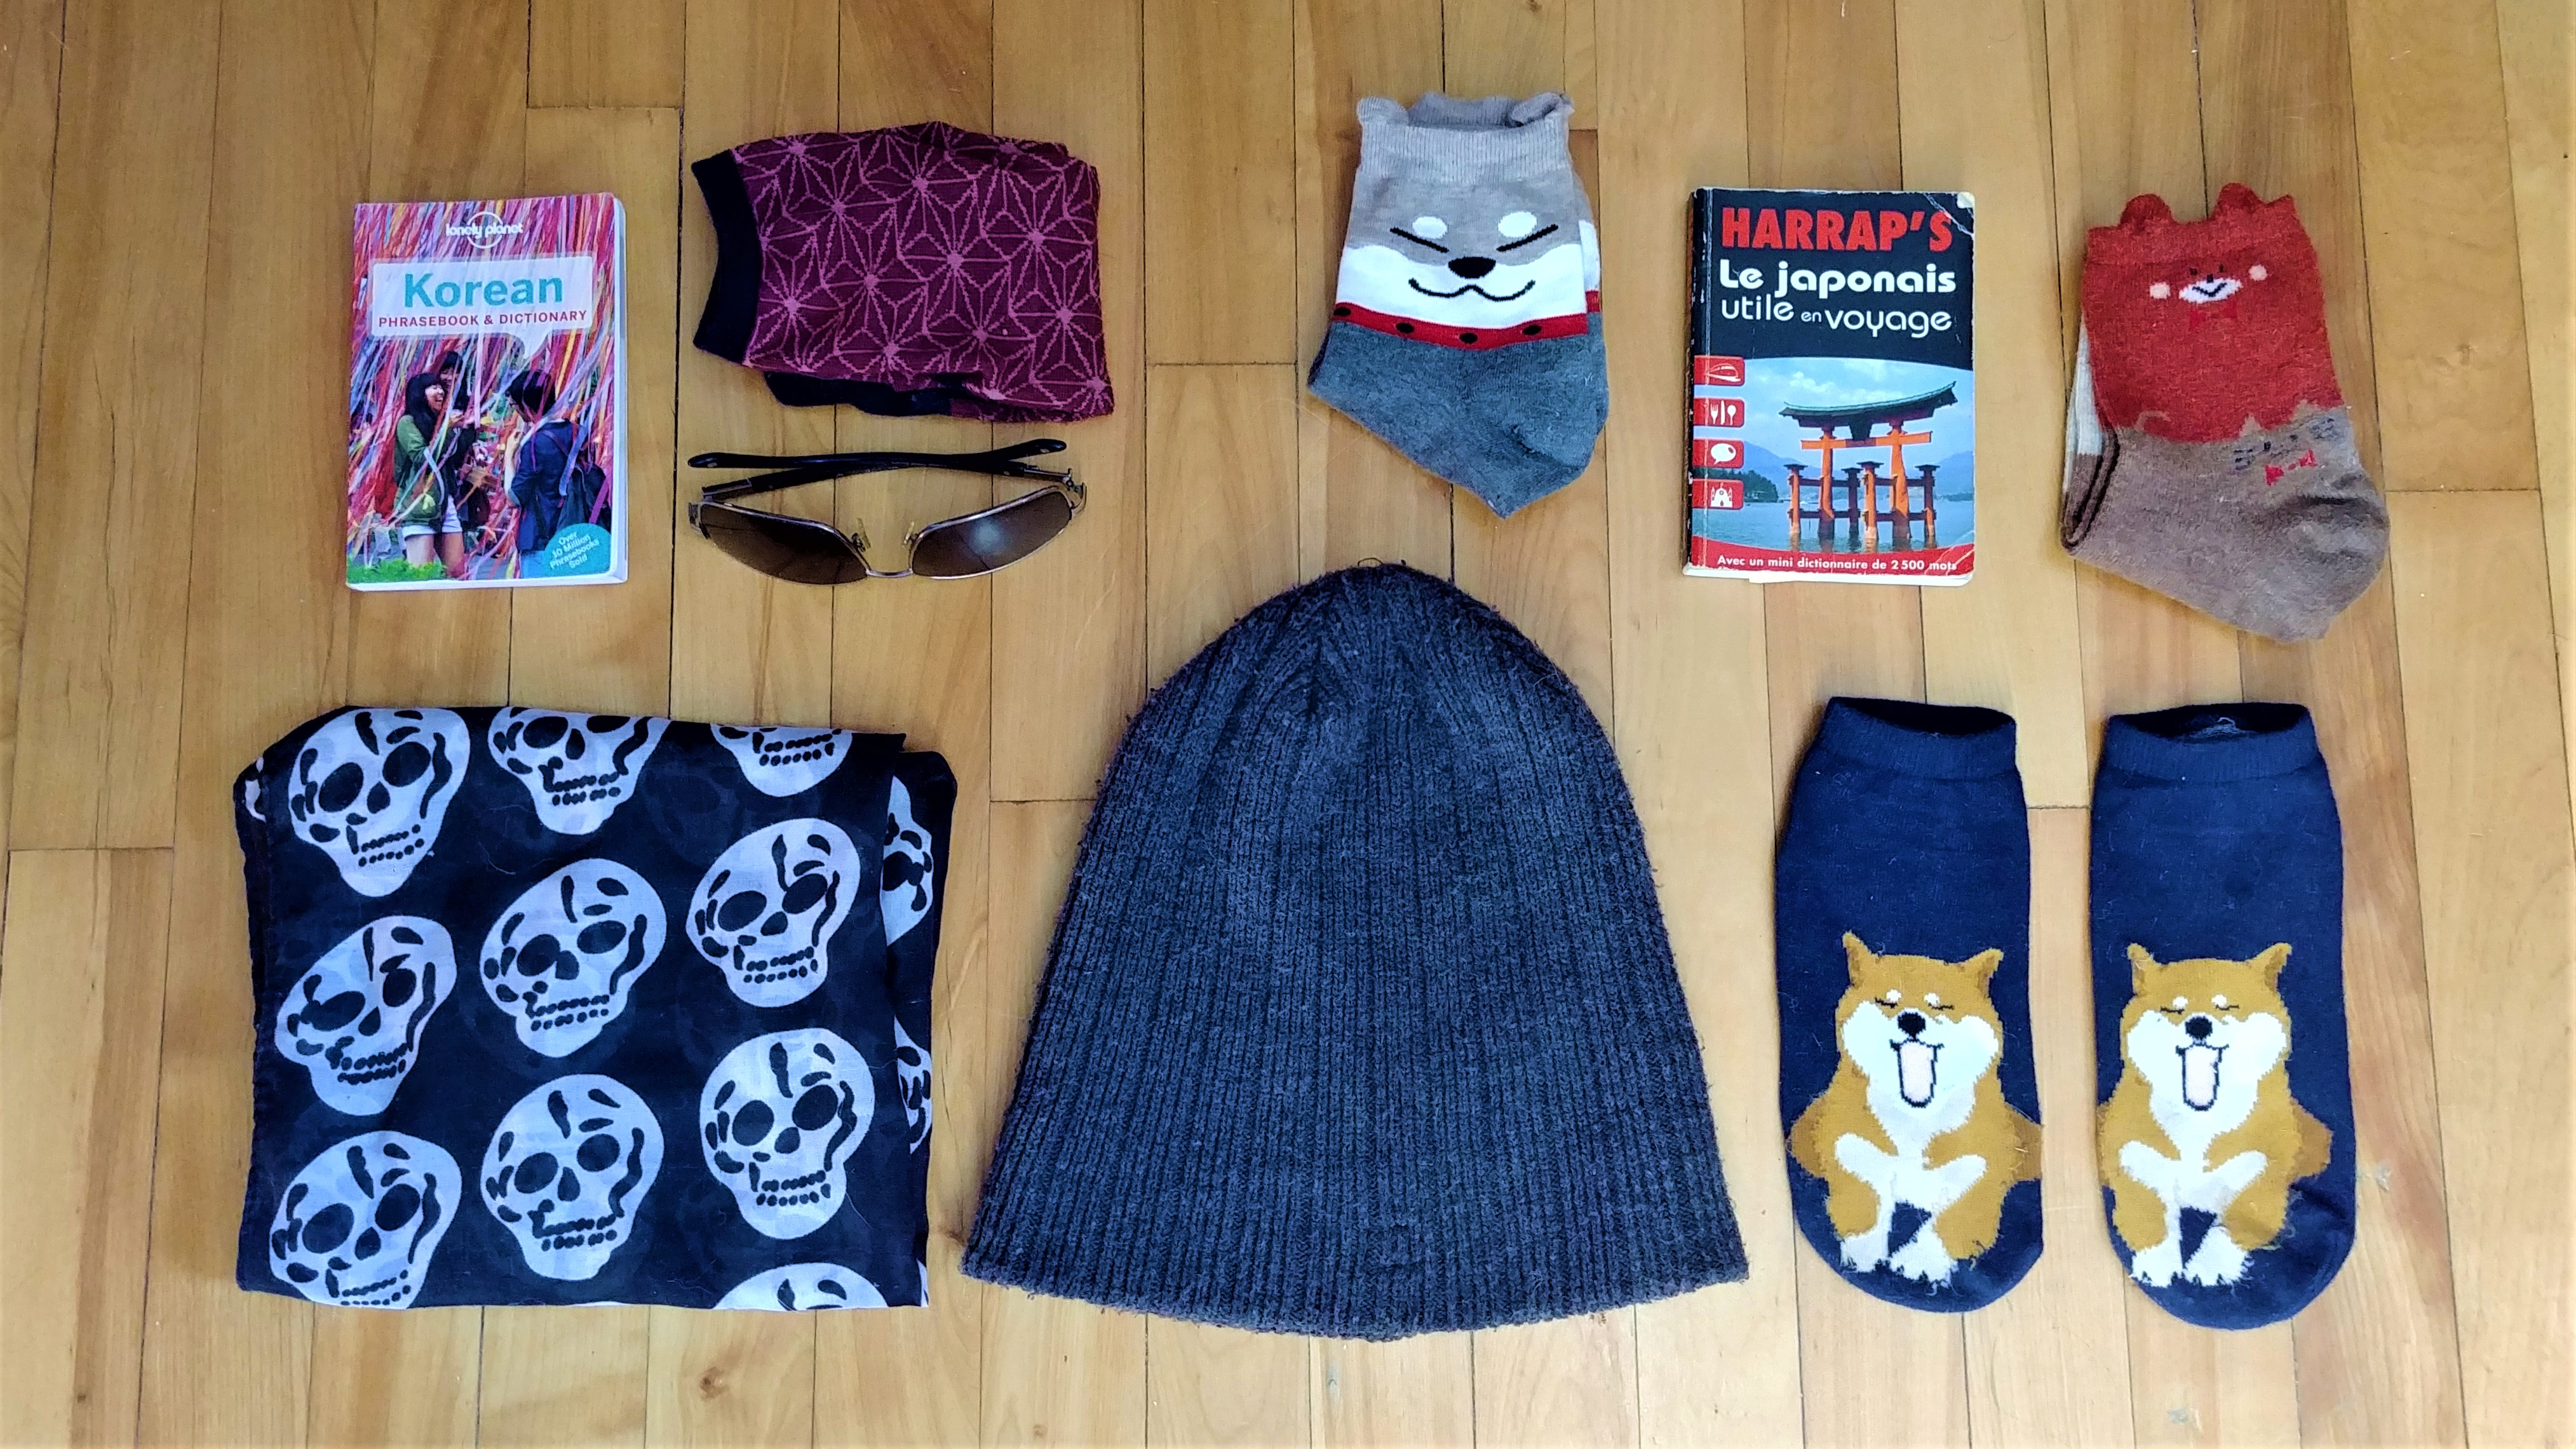 valise minimaliste voyage asie japon coree blog voyage arpenter le chemin